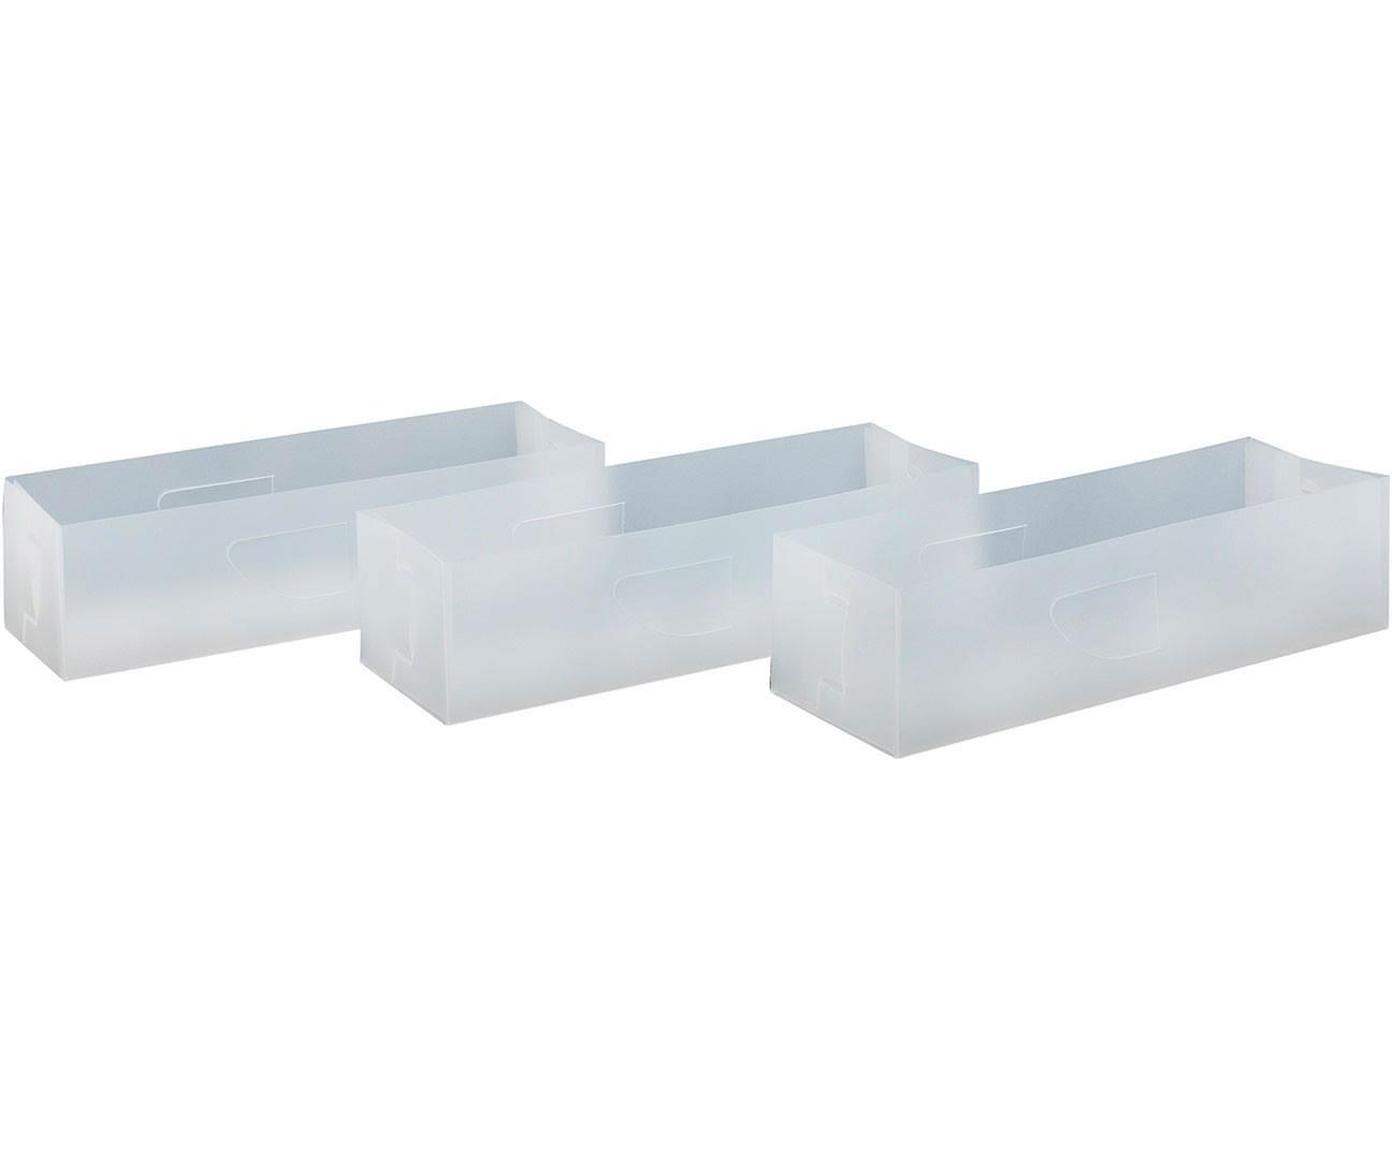 Organizadores Brunami, 12 uds., Polipropileno, Transparente, An 30 x Al 8 cm